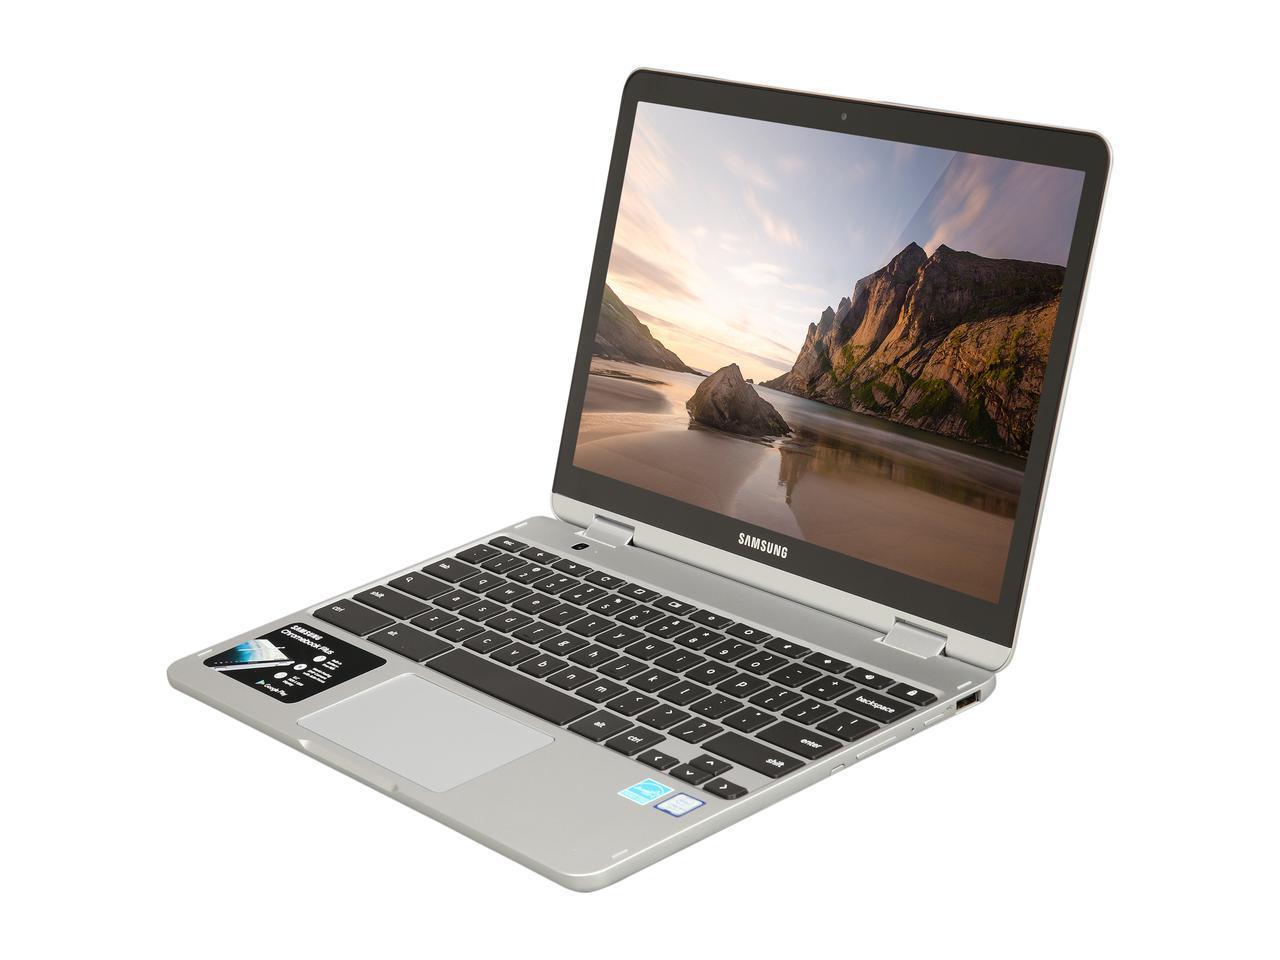 Samsung Chromebook Plus, 2-in-1, Intel Core m3, 4GB RAM, 64GB eMMC, 13MP  Camera, Chrome OS, 12 2